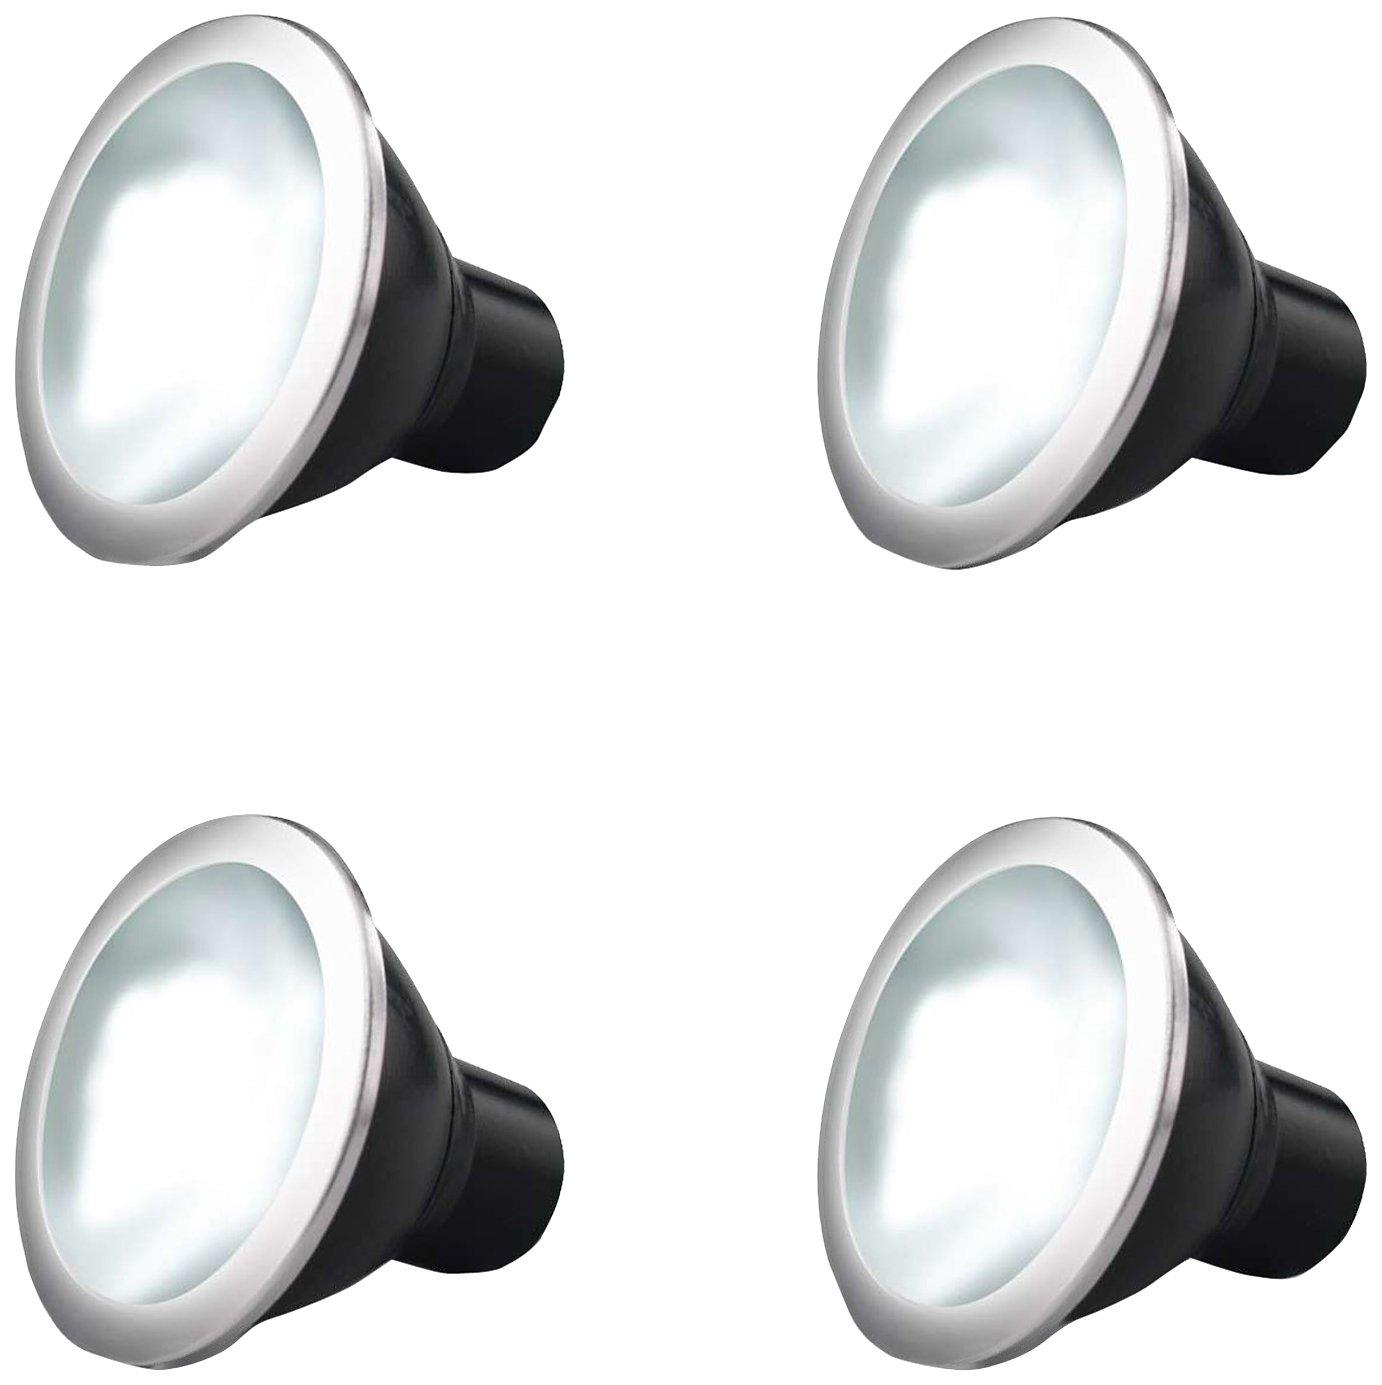 Reon Powerspot RLKSM05GU10-30-F - Bombilla LED (GU10, 5 W): Amazon.es: Iluminación